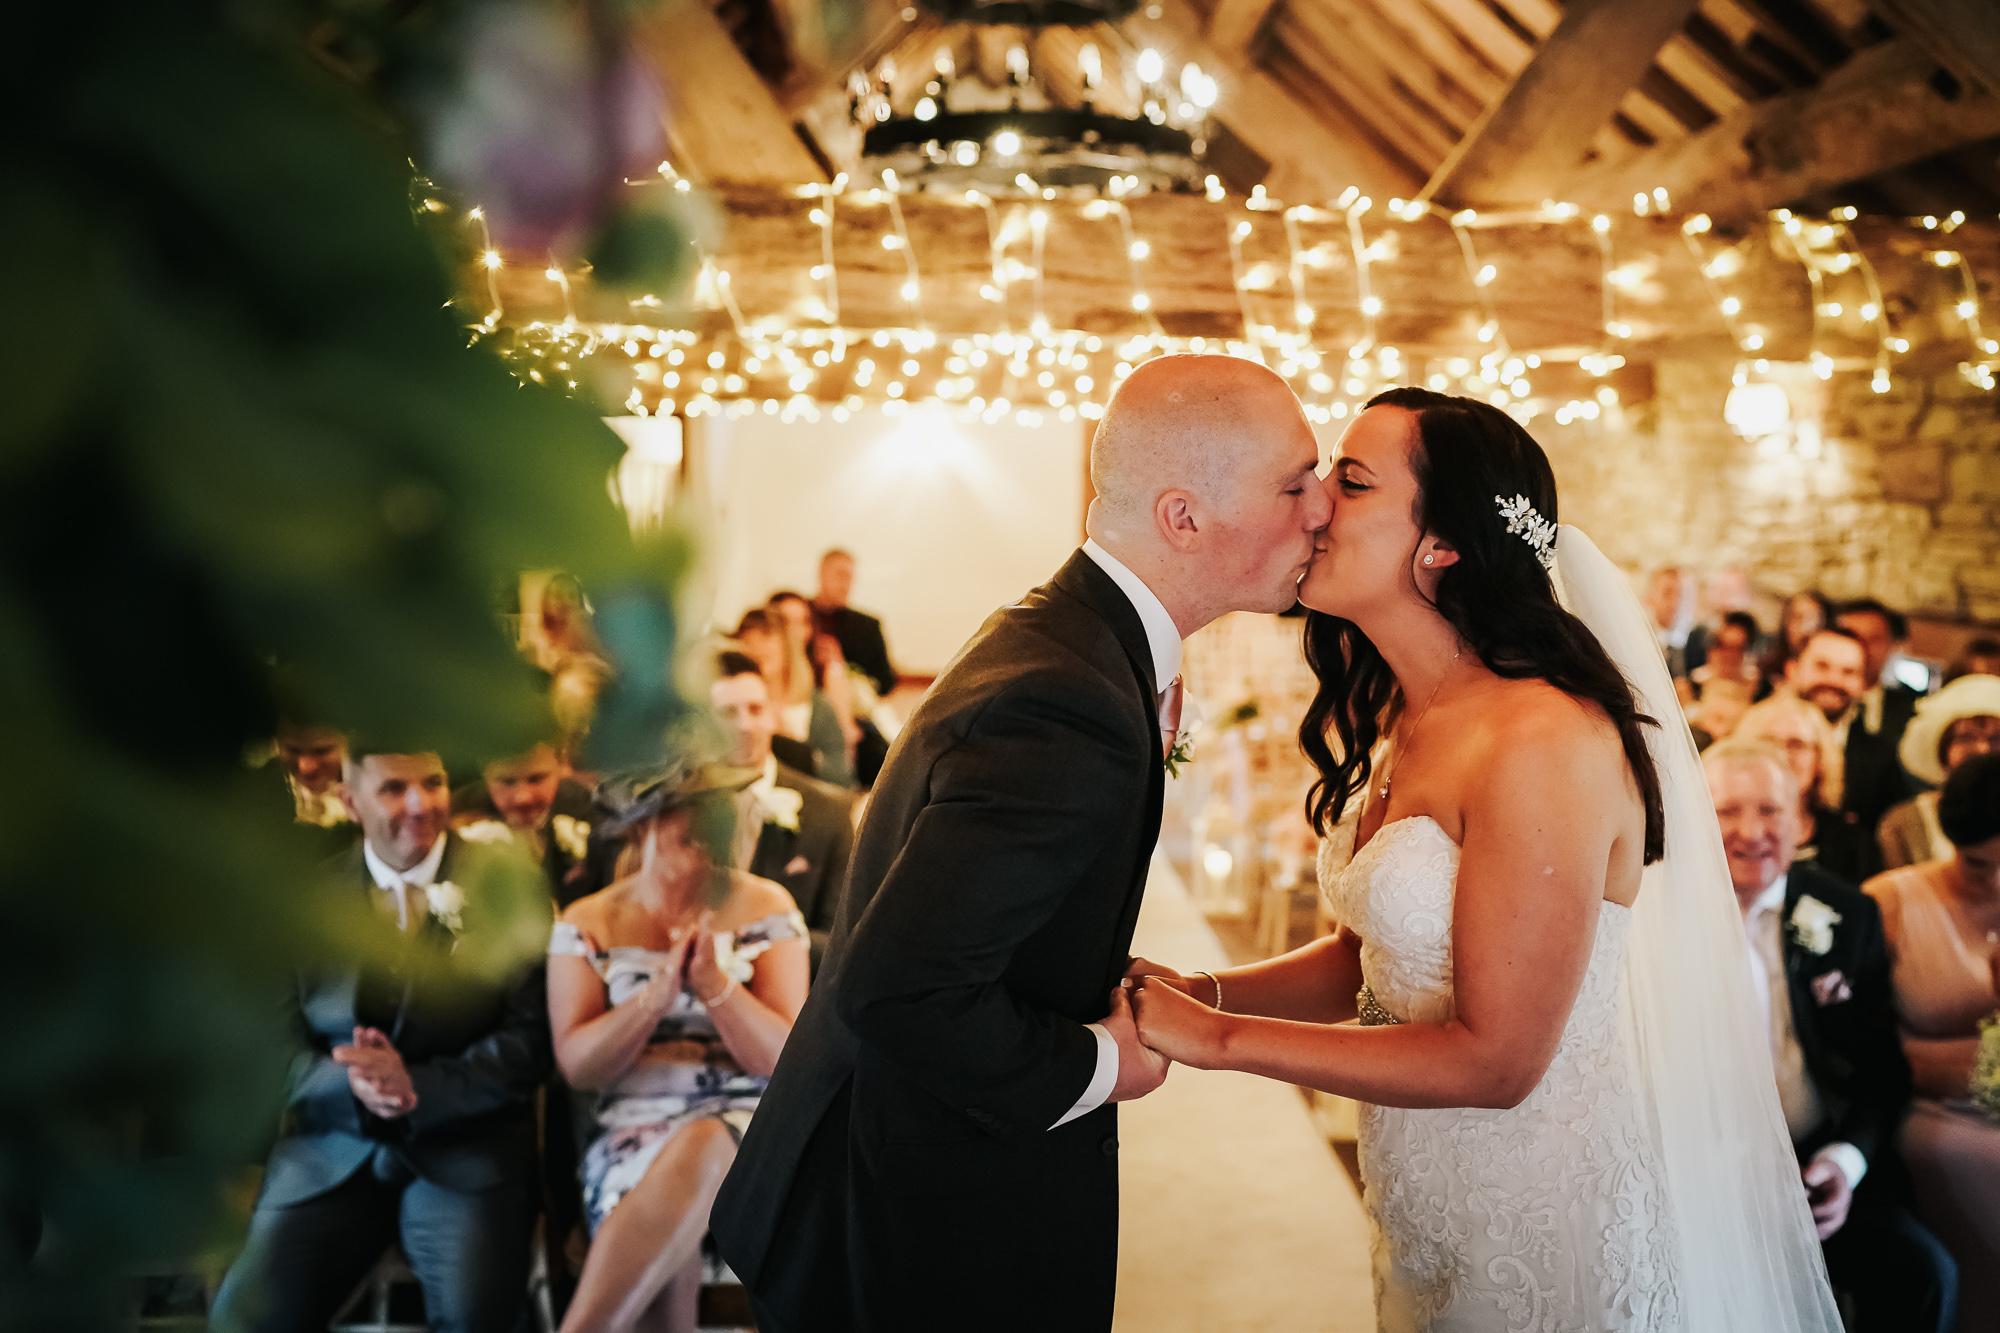 Hyde Bank Farm Wedding Photography Manchester wedding photographer (25 of 49).jpg